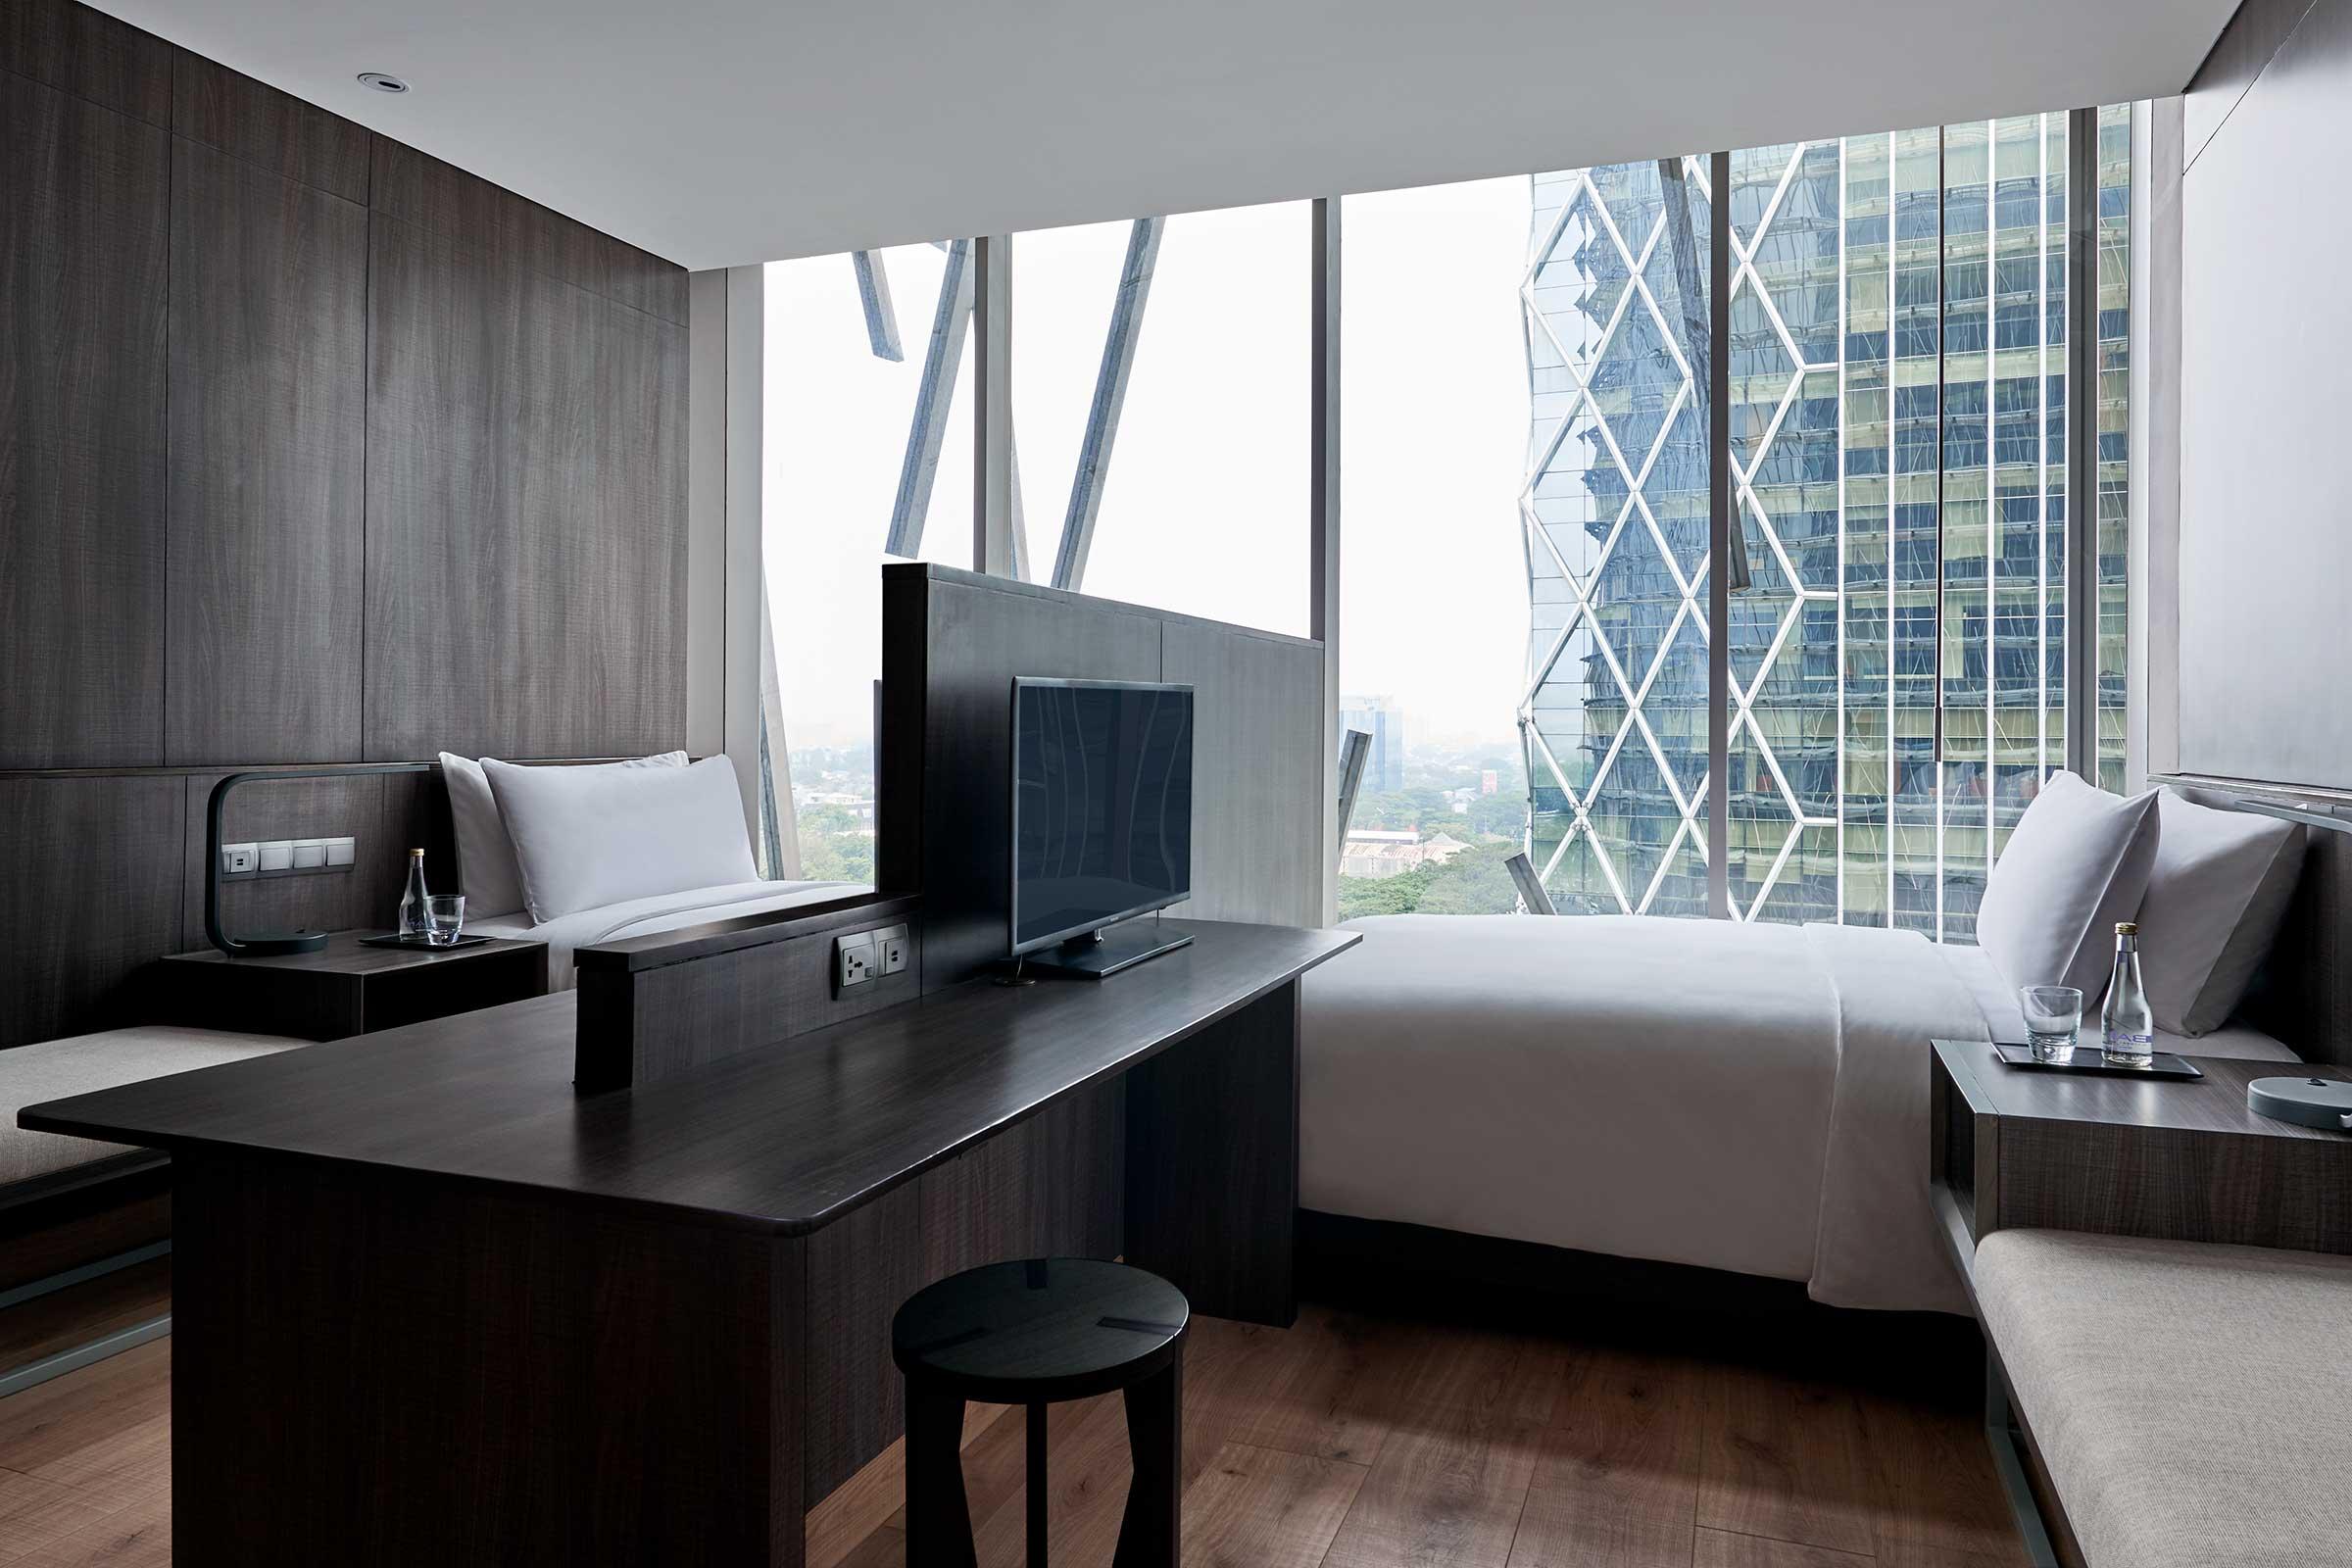 AJS---Accommodation---Studio-Twin---Bedroom.jpg